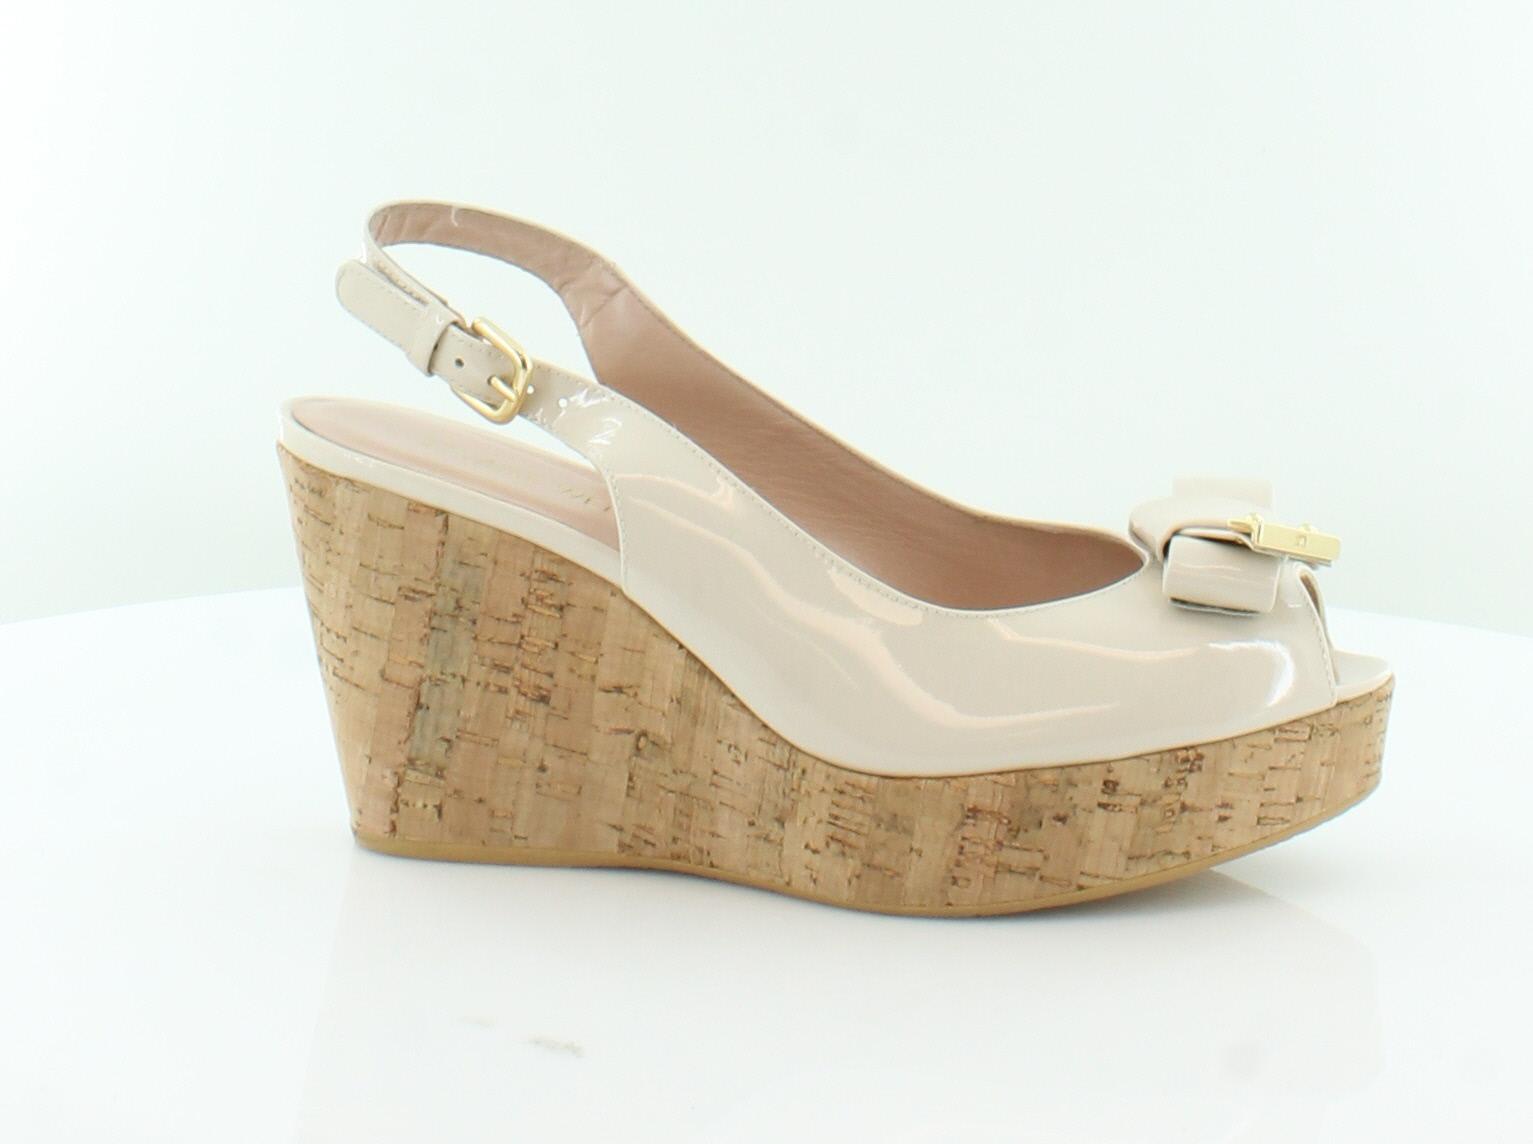 Stuart Weitzman Pink Bodajean Women's Heels Pink Weitzman Size 8.5 M 7bac82